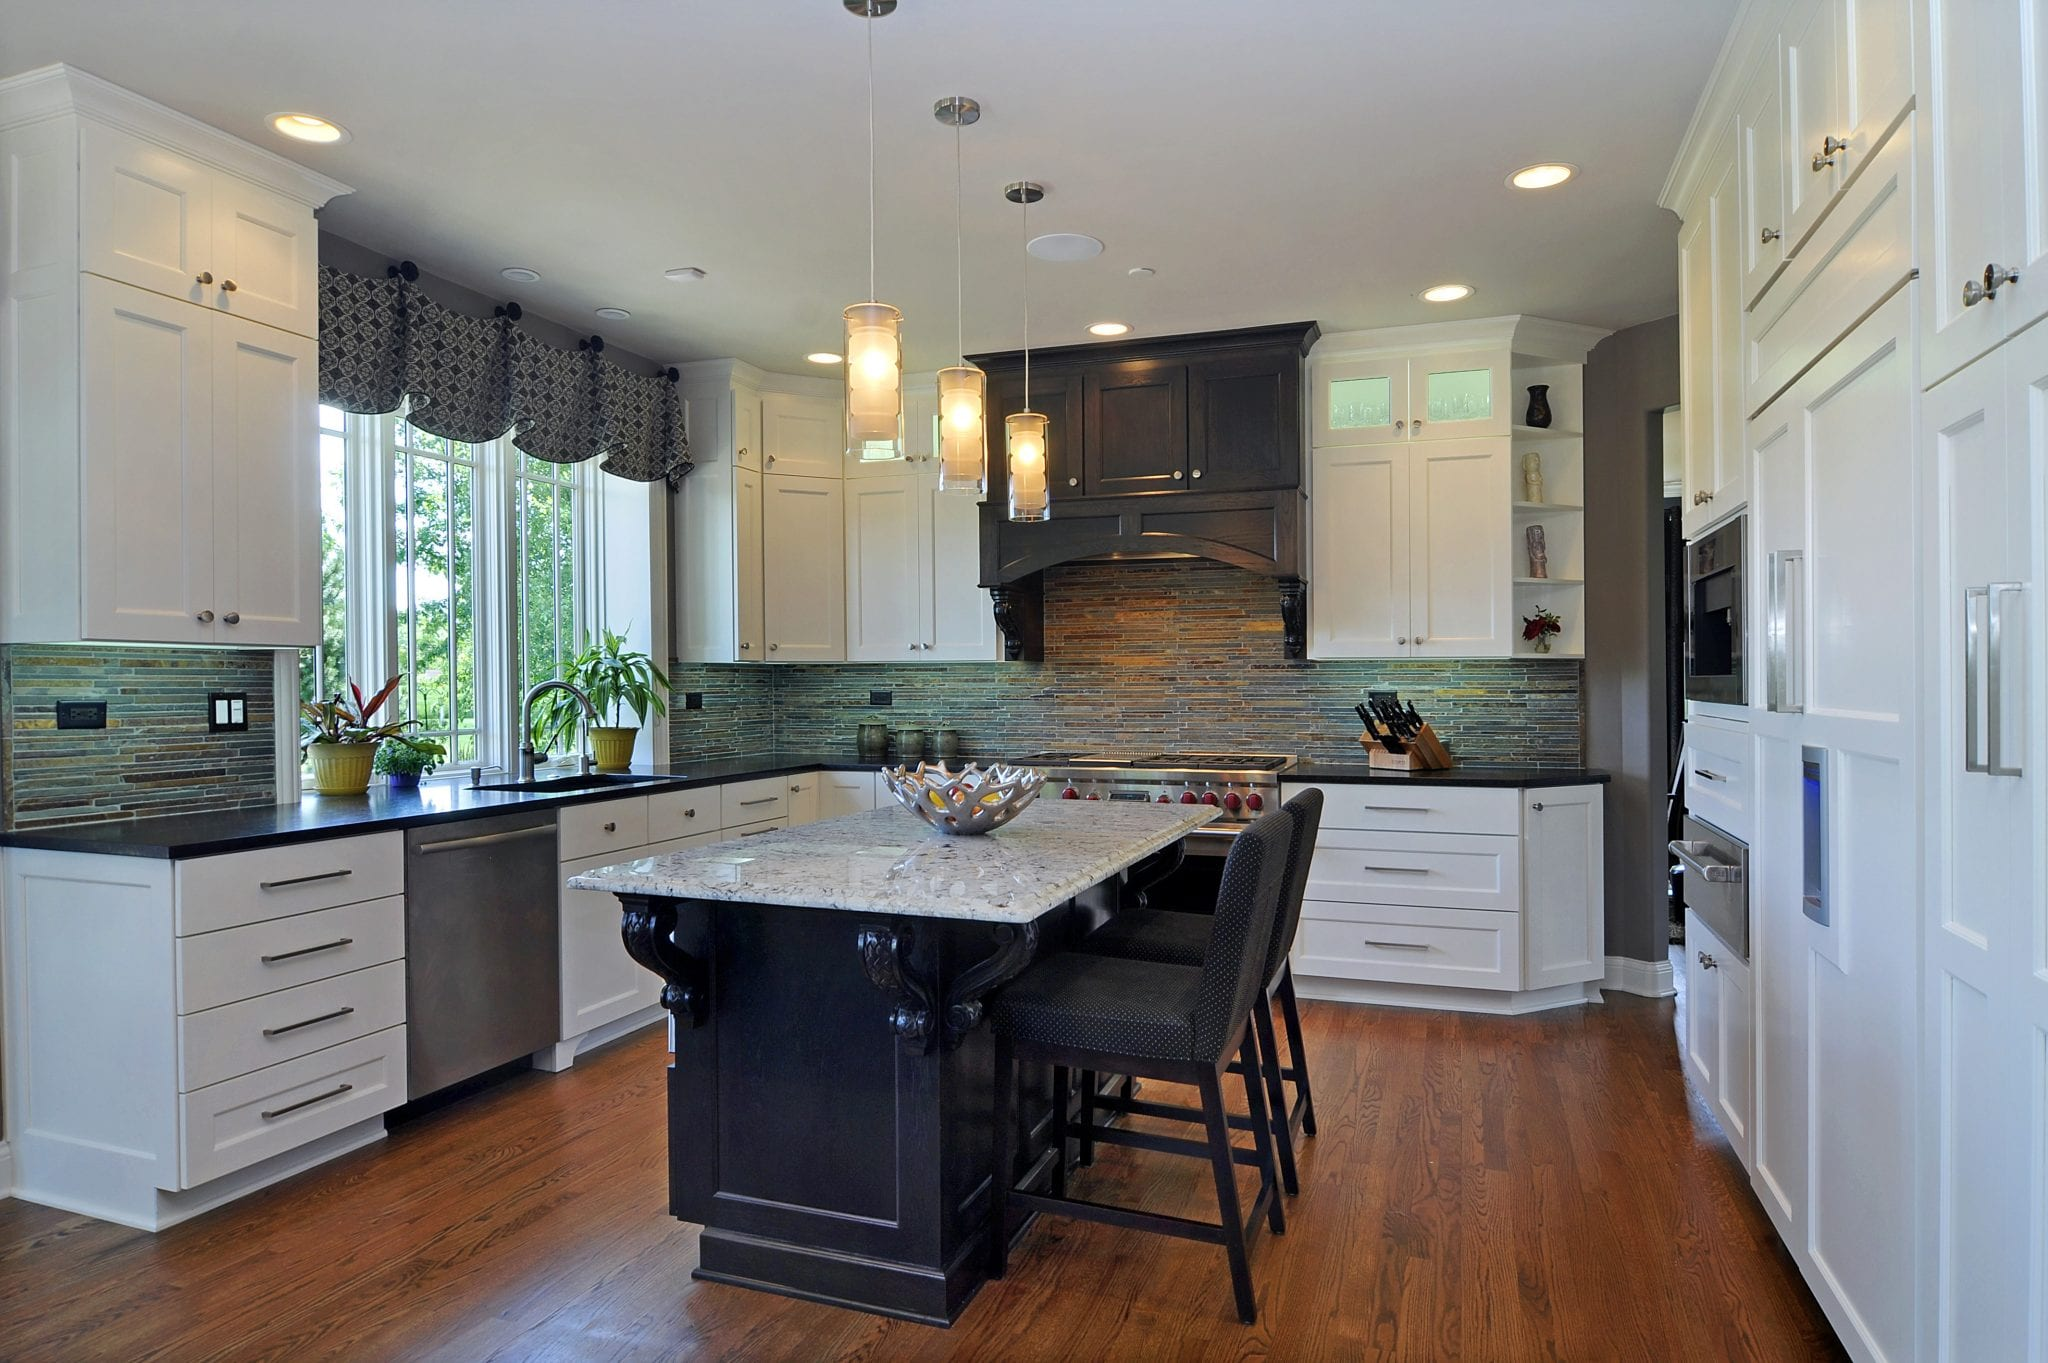 expert kitchens remodeling illinois kitchen interior design kitchen design kitchen remodeling long grove illinois